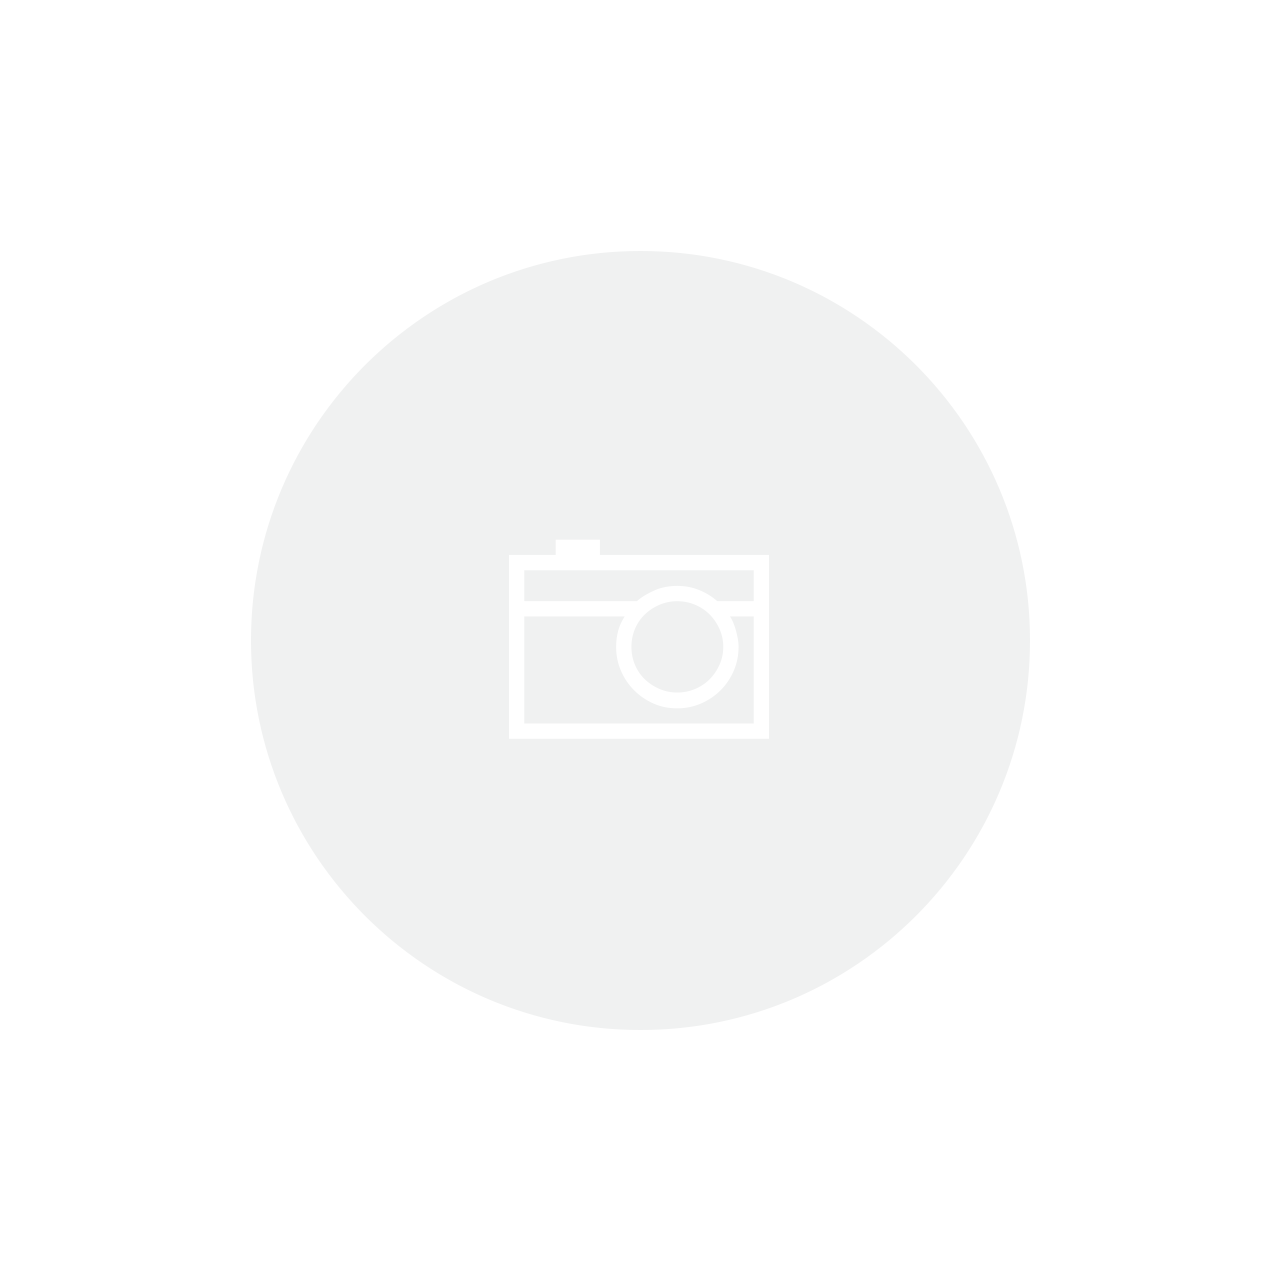 Panela Inox 16Cm 1,40 Litros Profissional Tramontina